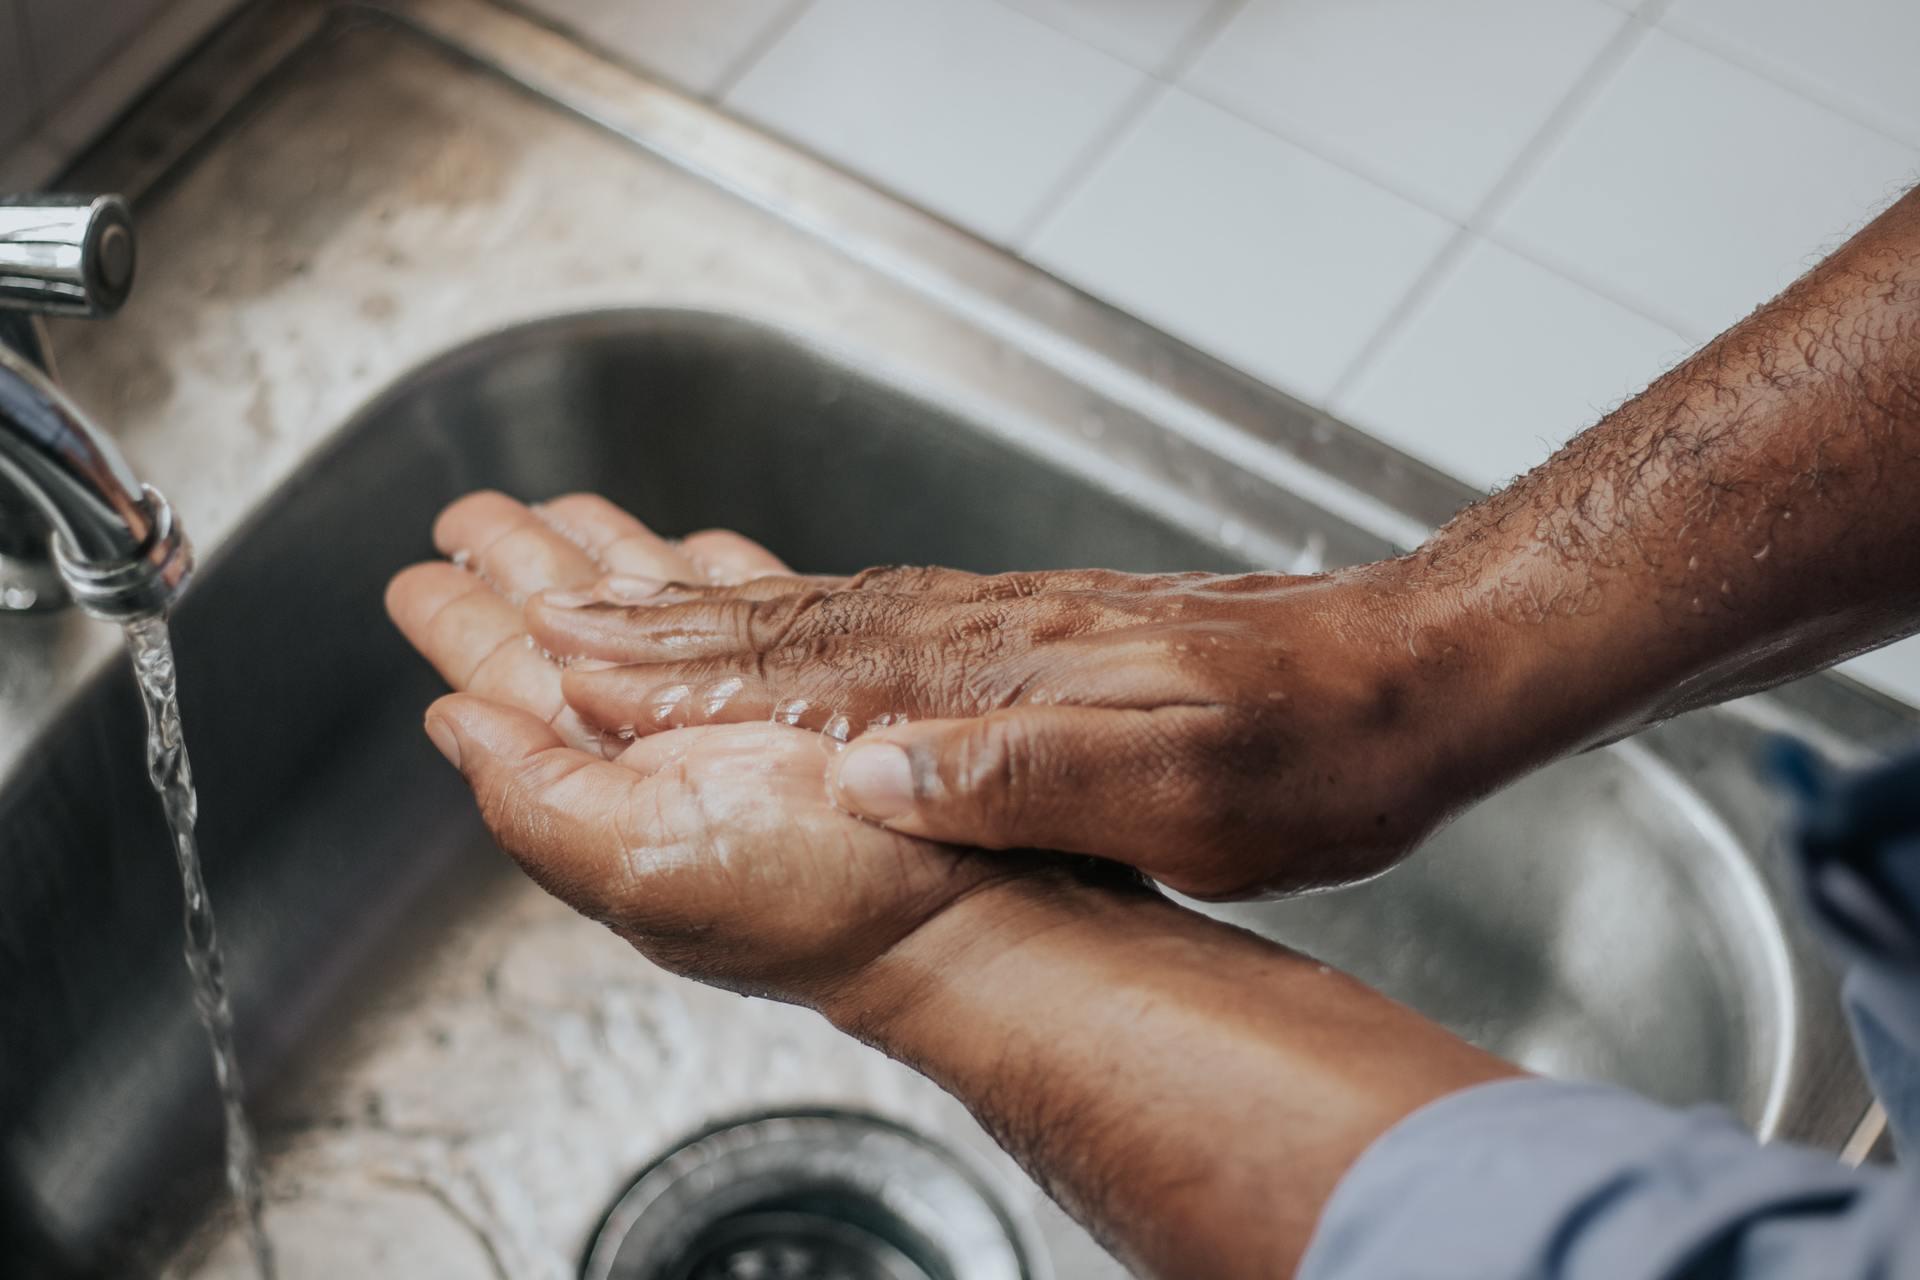 tips for sharing the bathroom during coronavirus